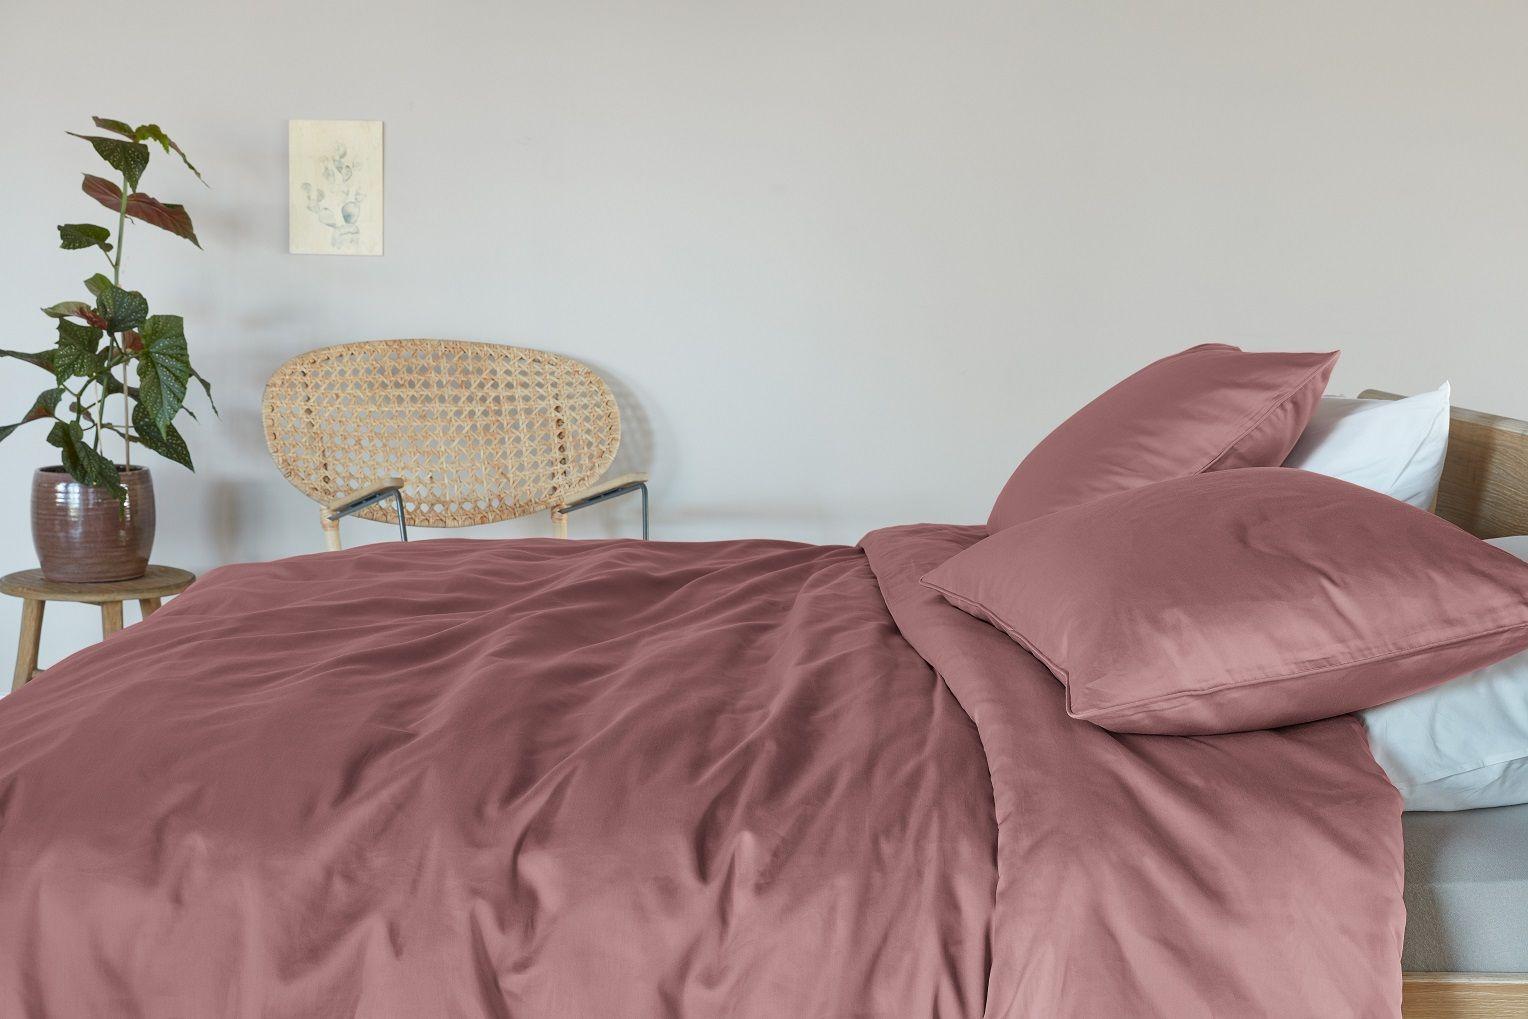 Beddinghouse Conscious dekbedovertrek